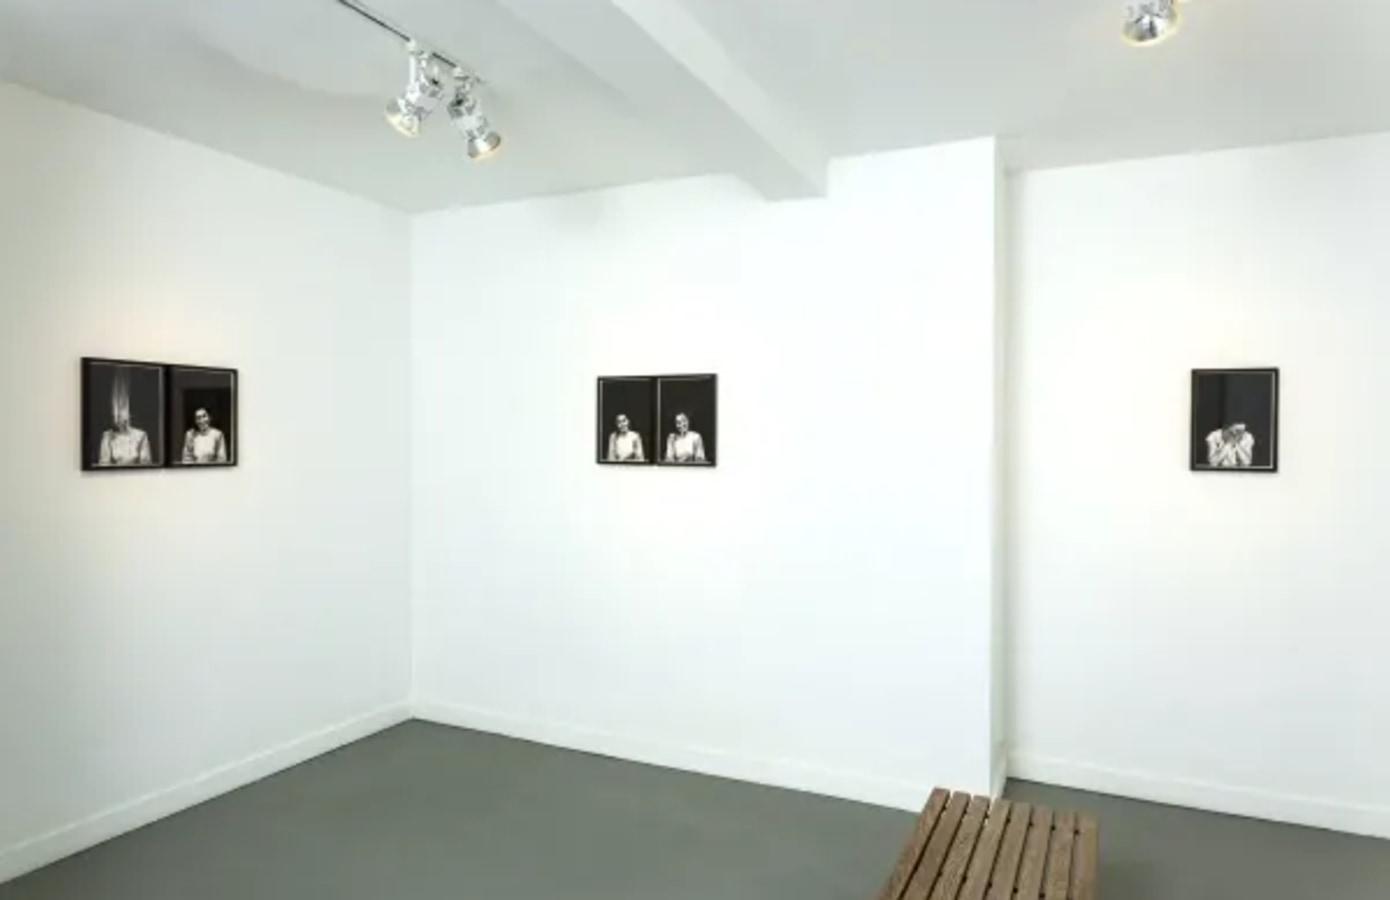 Double Projection, Meiro Koizumi,